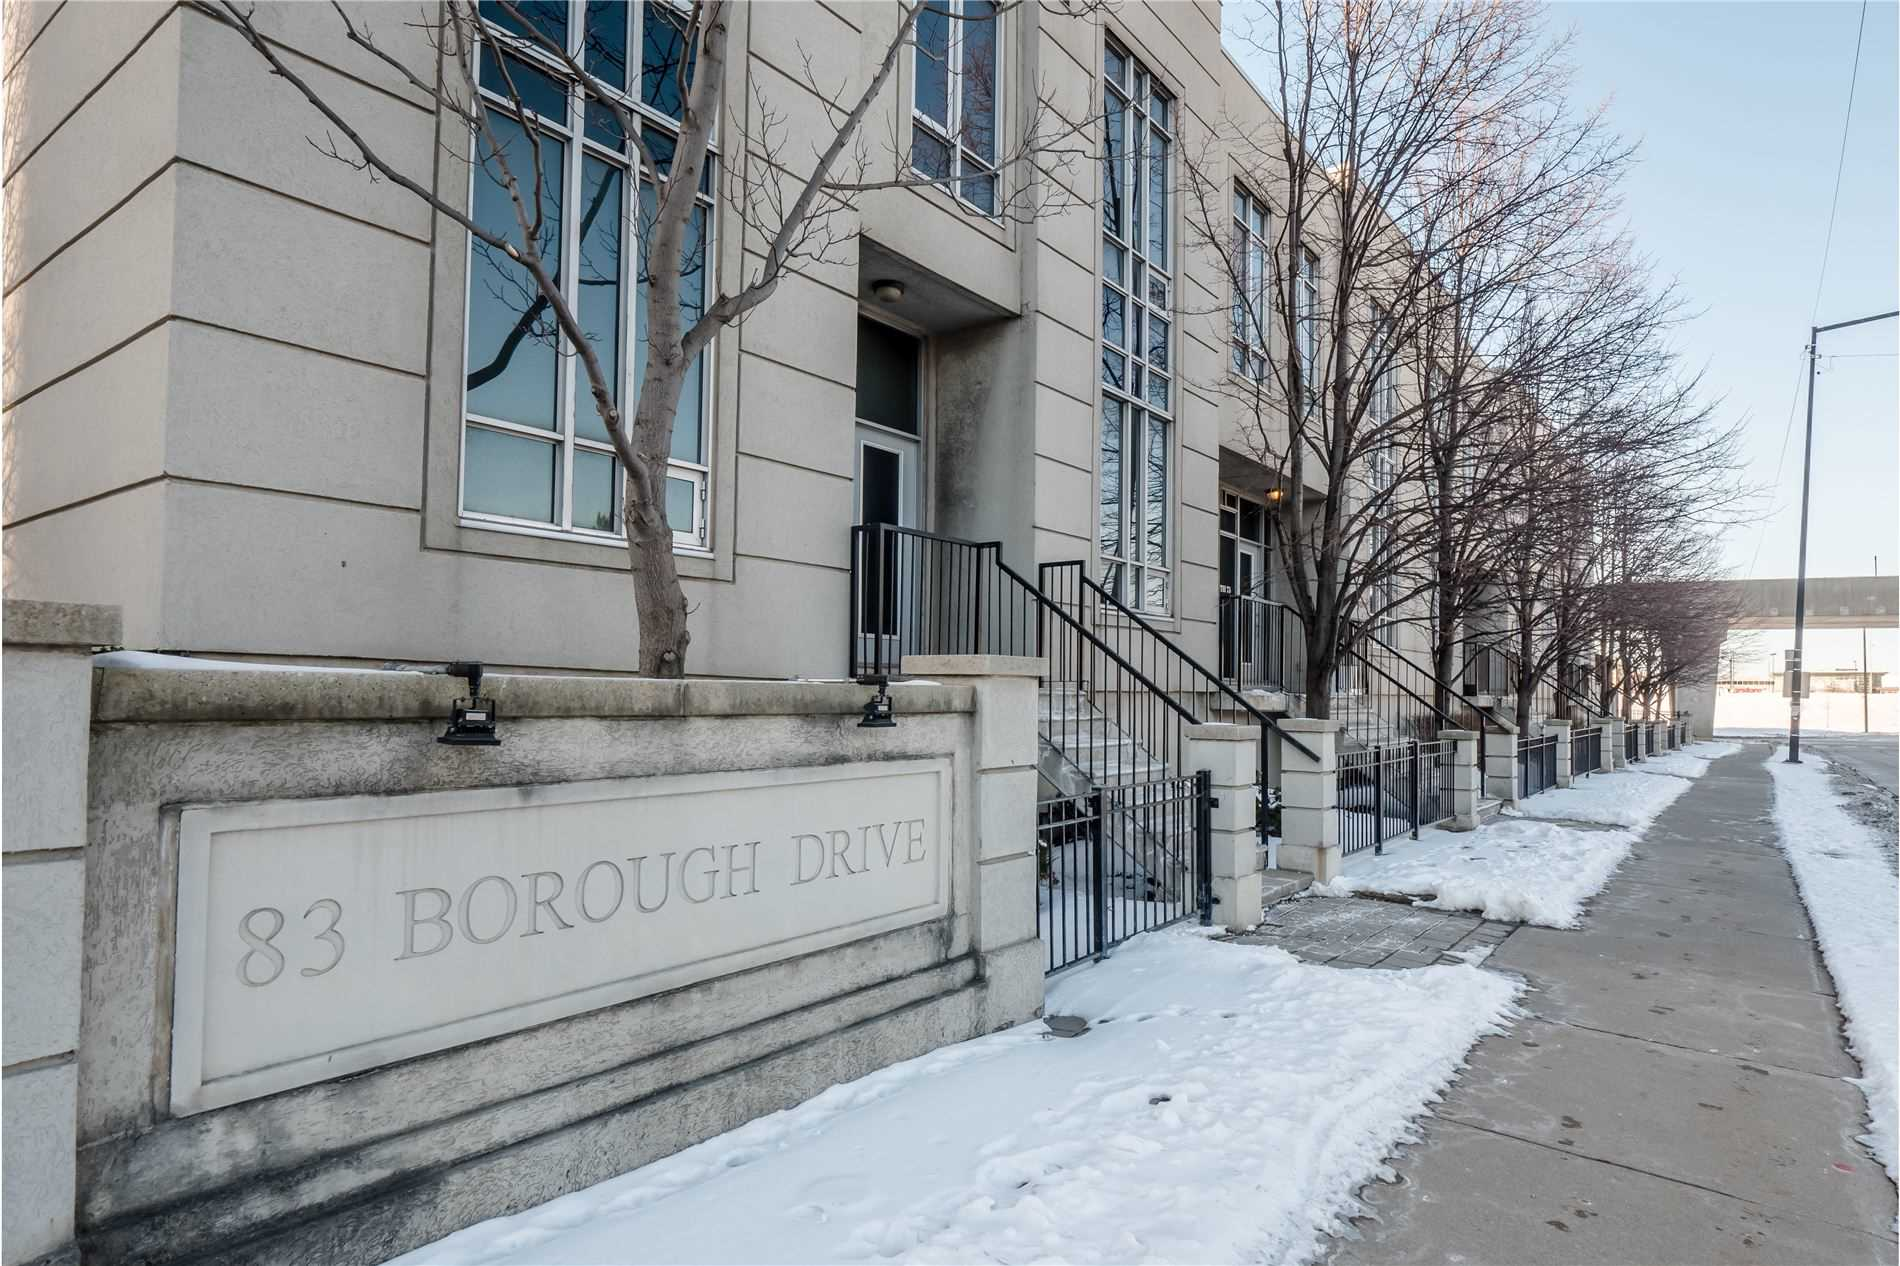 th77 - 83 Borough Dr